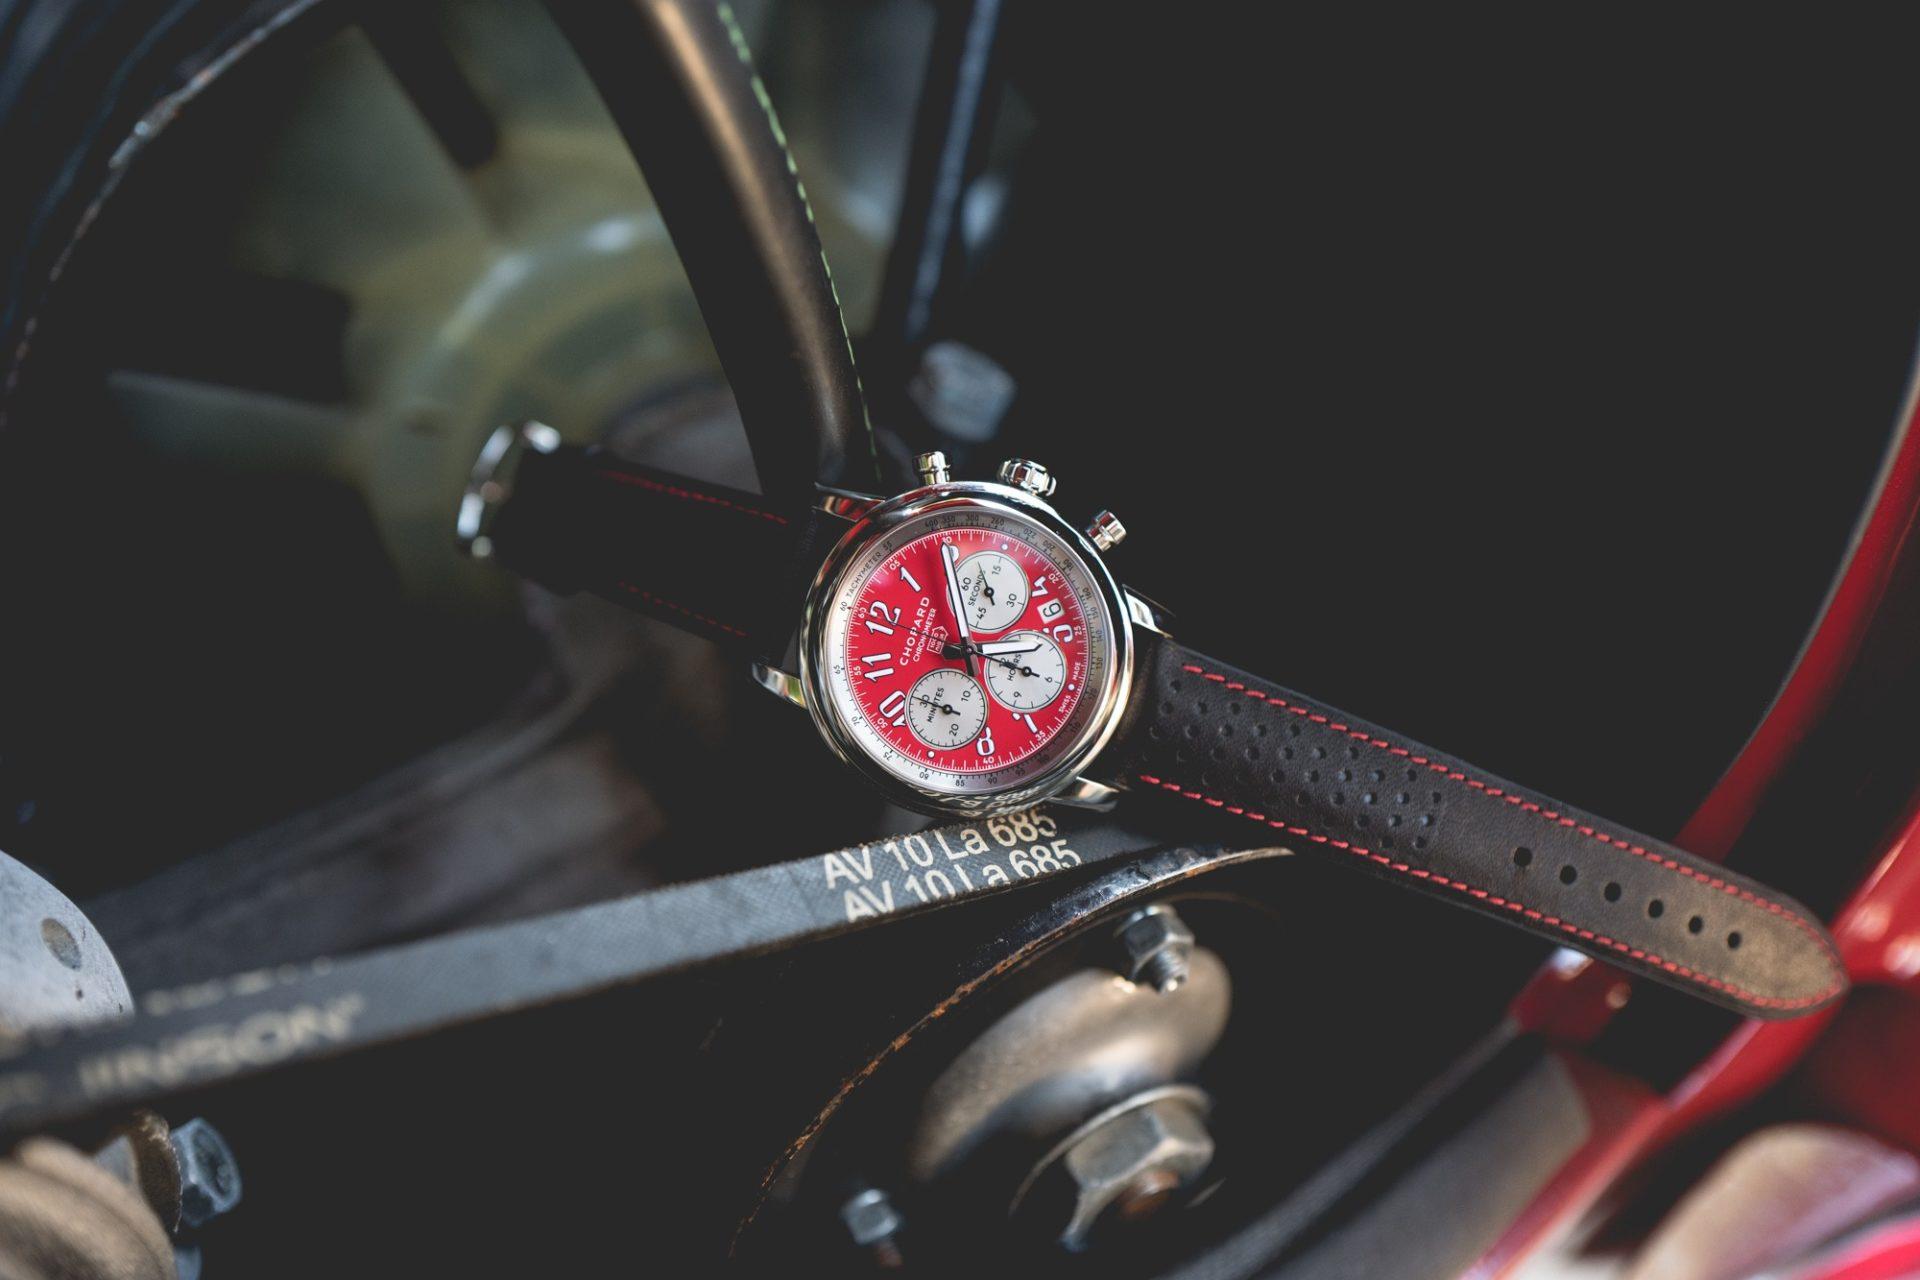 Chopard Mille Miglia 2018 Racing Colours - Rosso Corsa